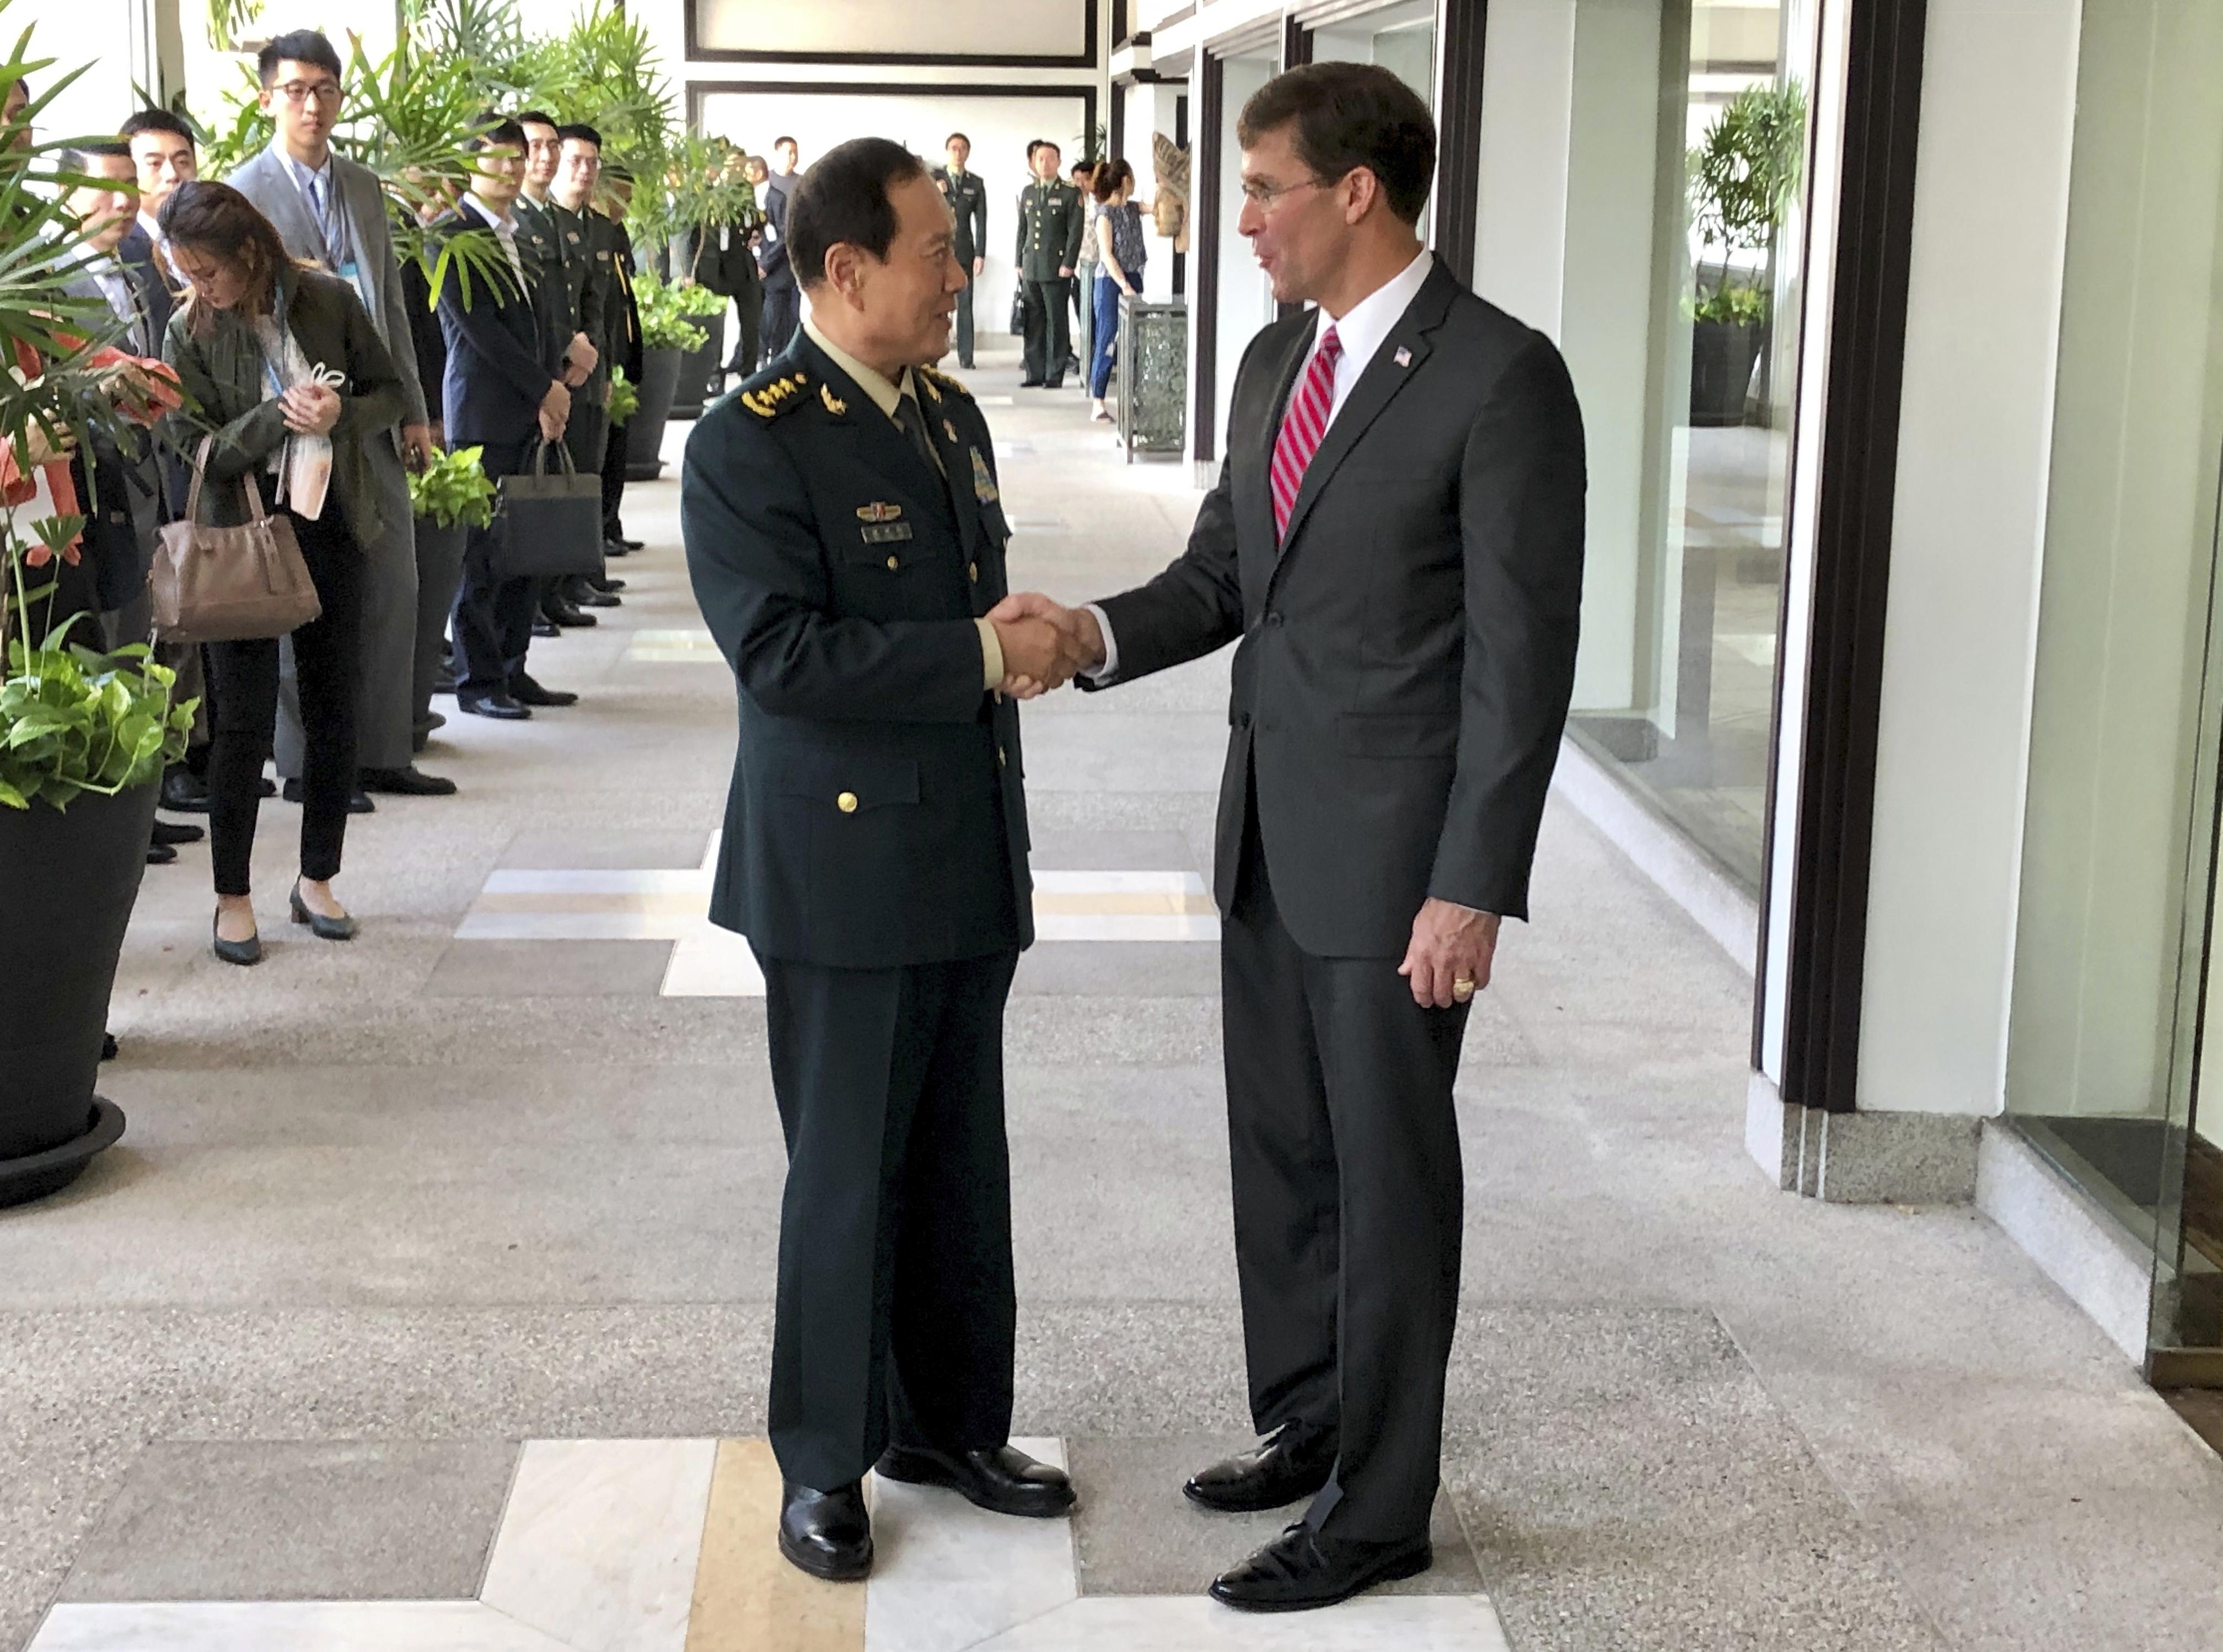 Chinese Defense Minister Wei Fenghe, left, greets U.S. Defense Secretary Mark Esper in Bangkok, Thailand, Monday, Nov. 18, 2019.